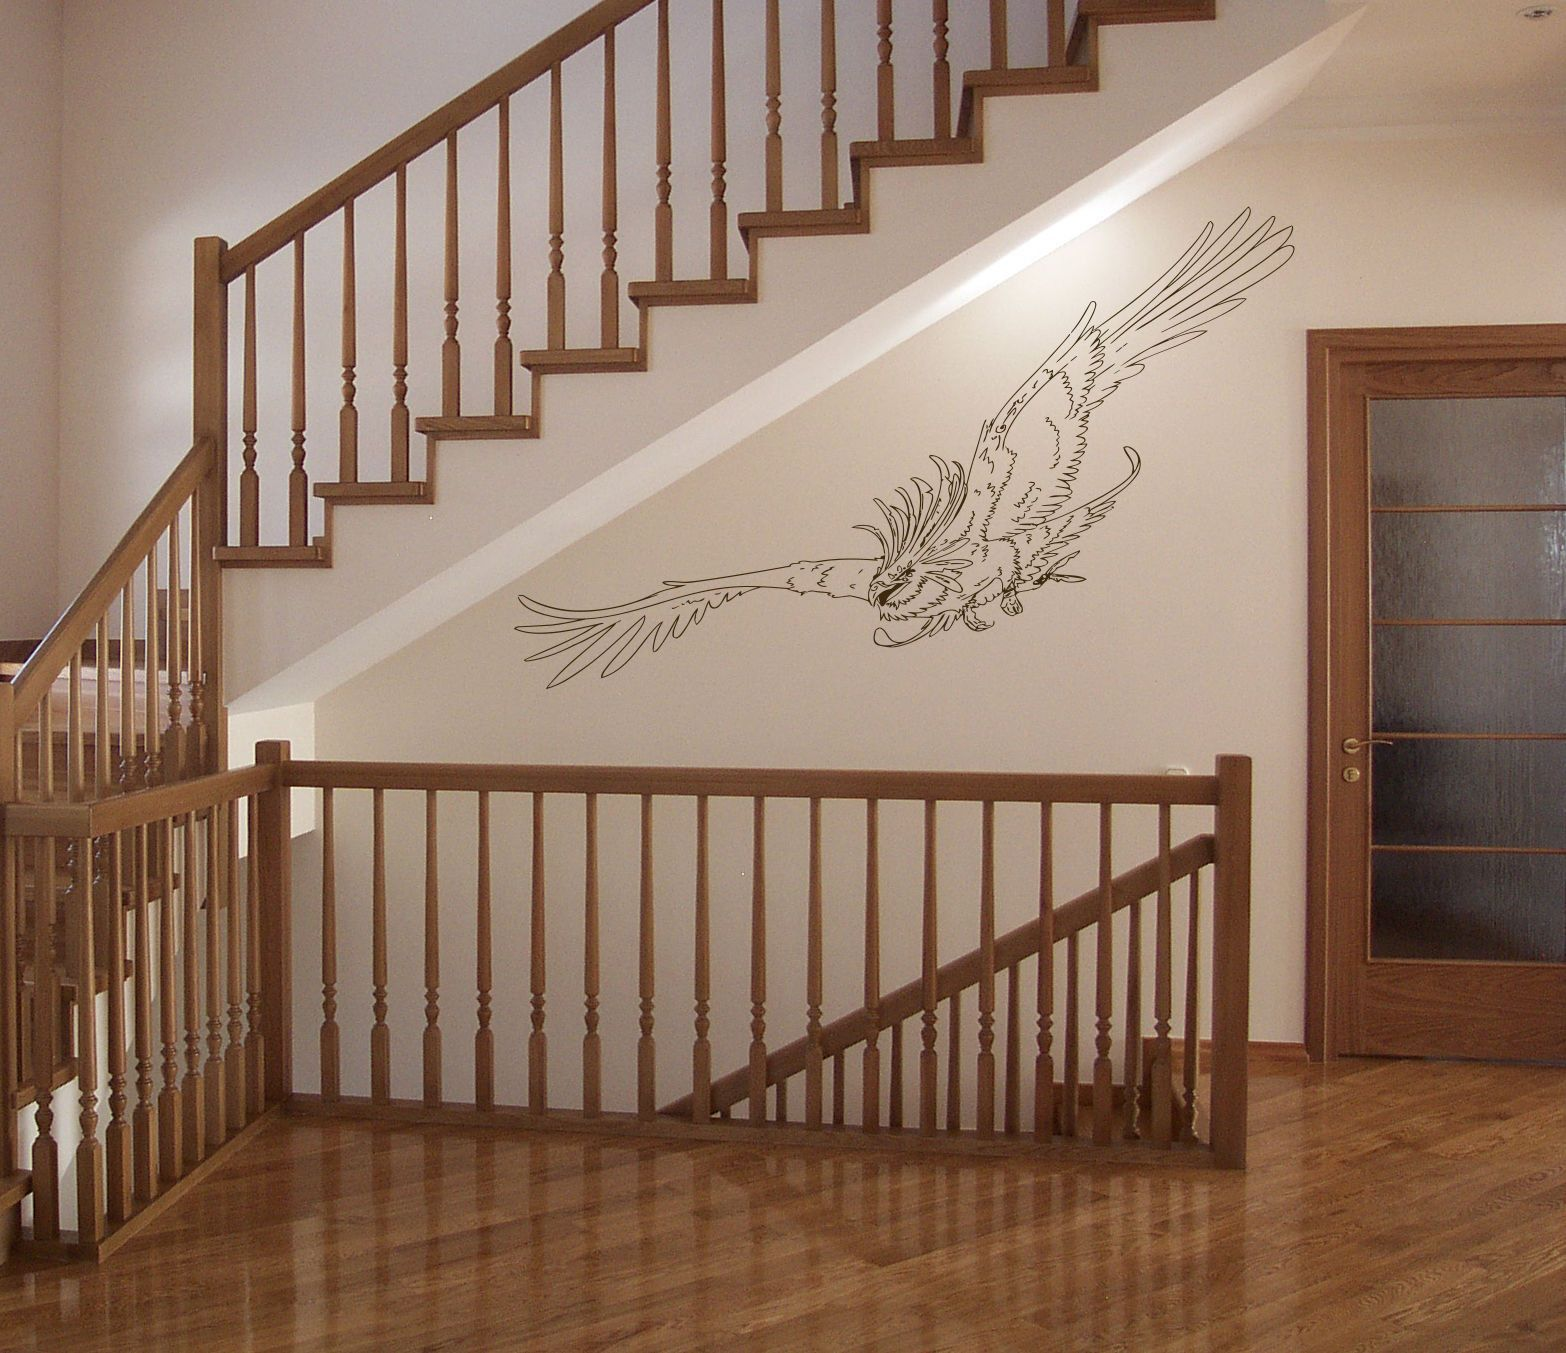 Anime decal Bird eagle Kids Room Children Stylish Wall Art Sticker 10180-2